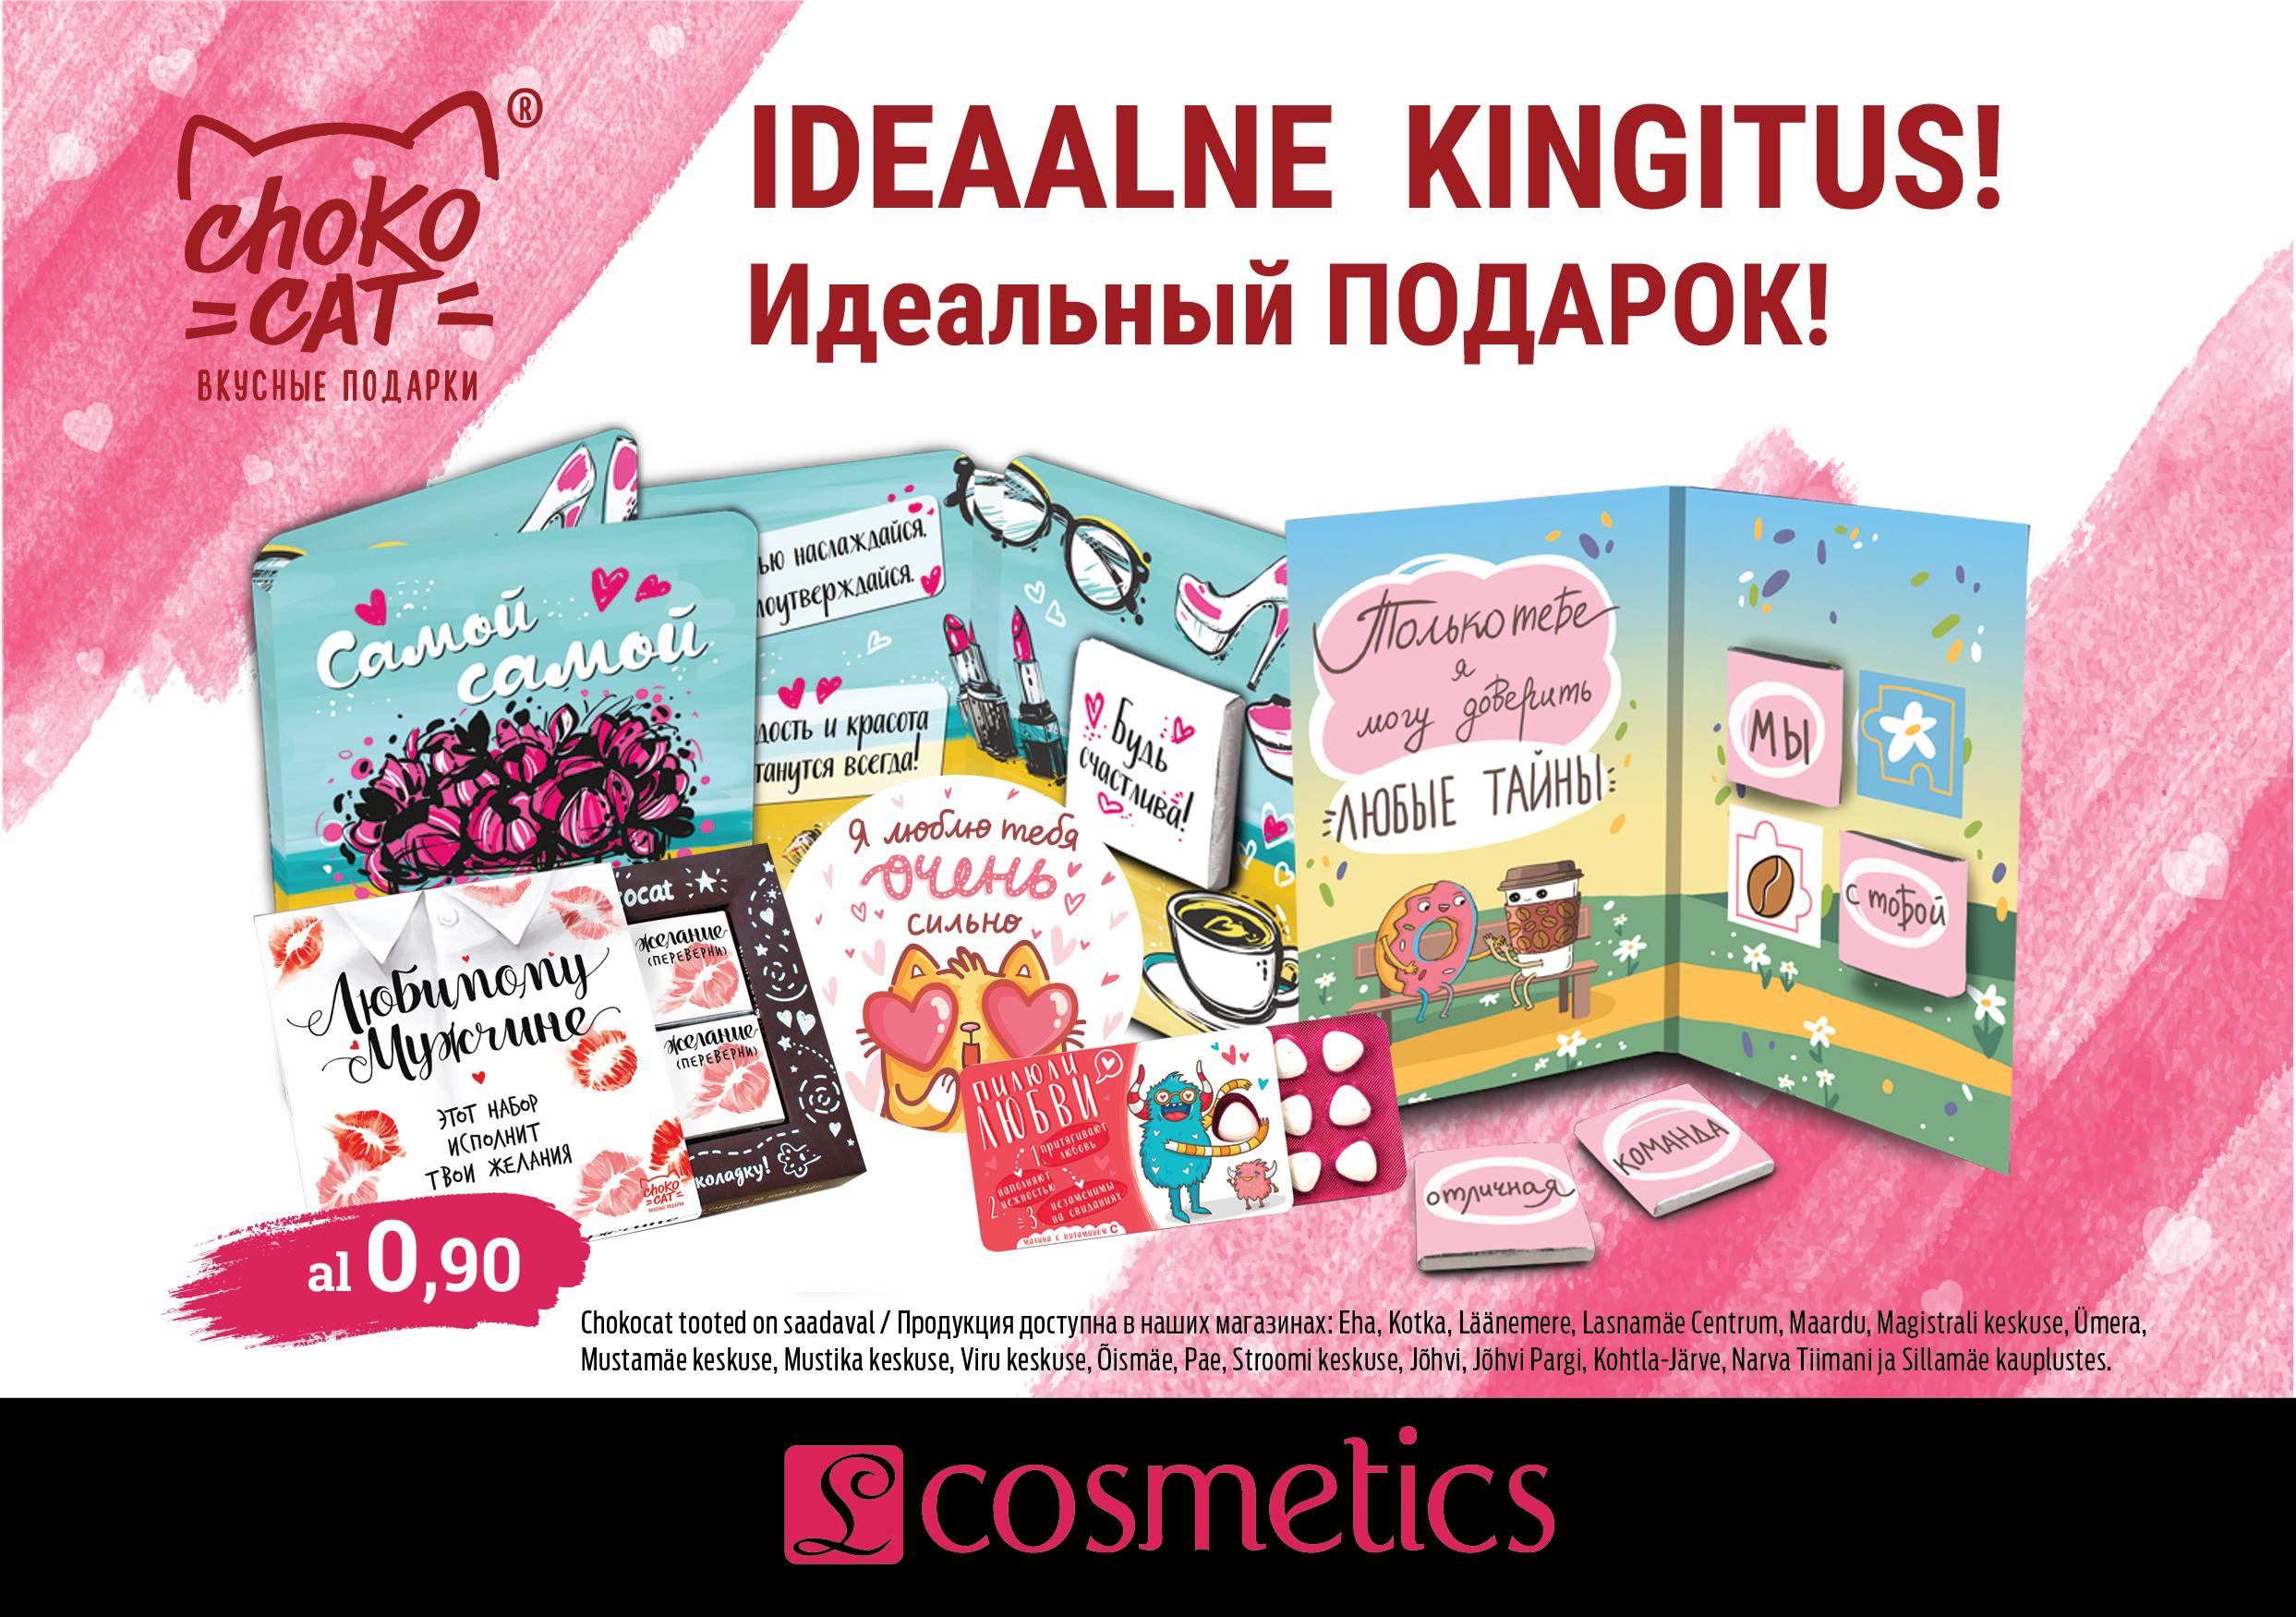 L cosmetics